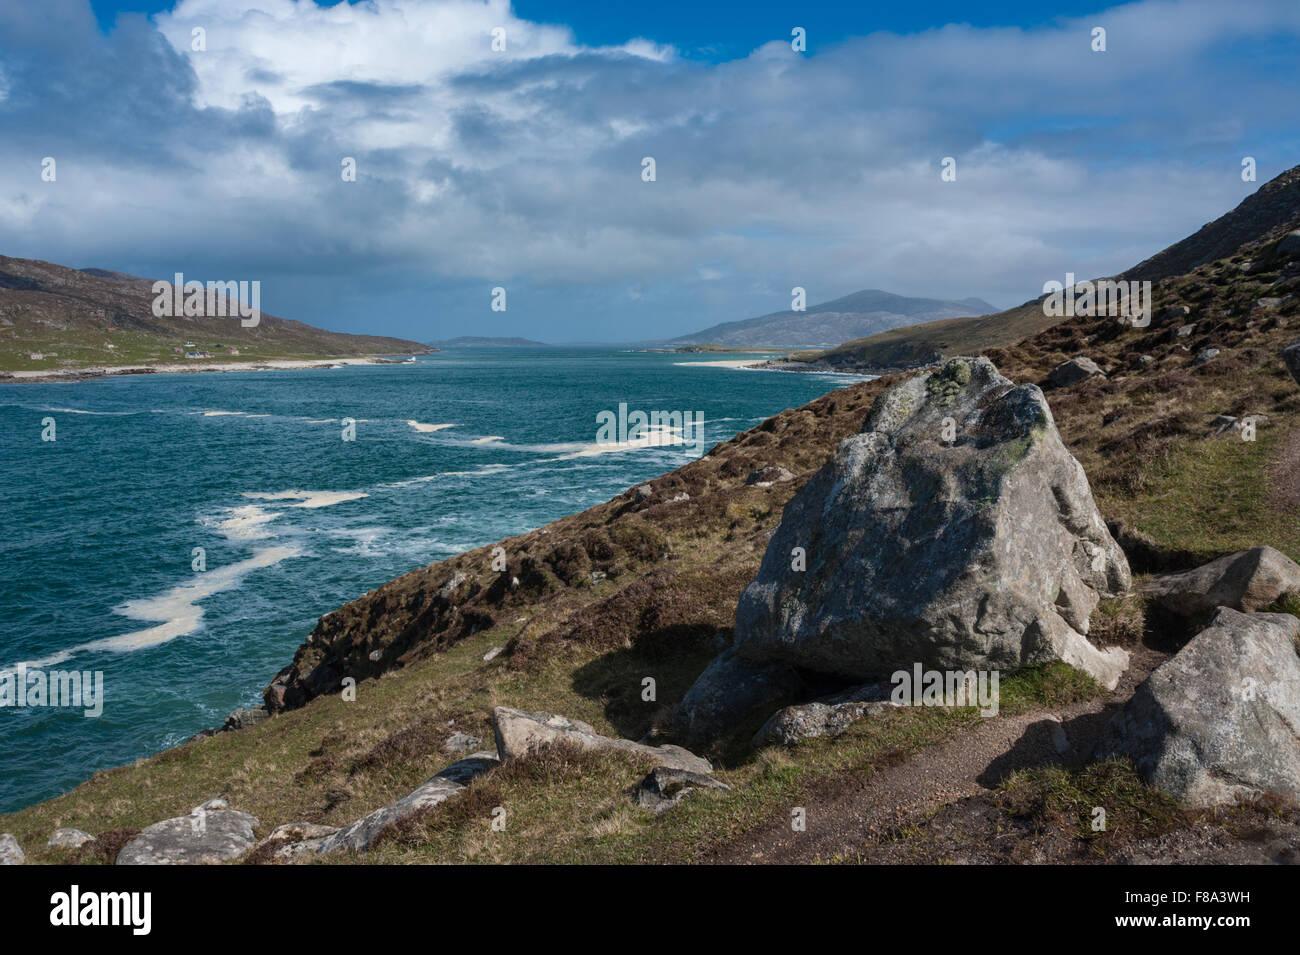 The Coastal path to Cravadale Isle of Harris - Stock Image